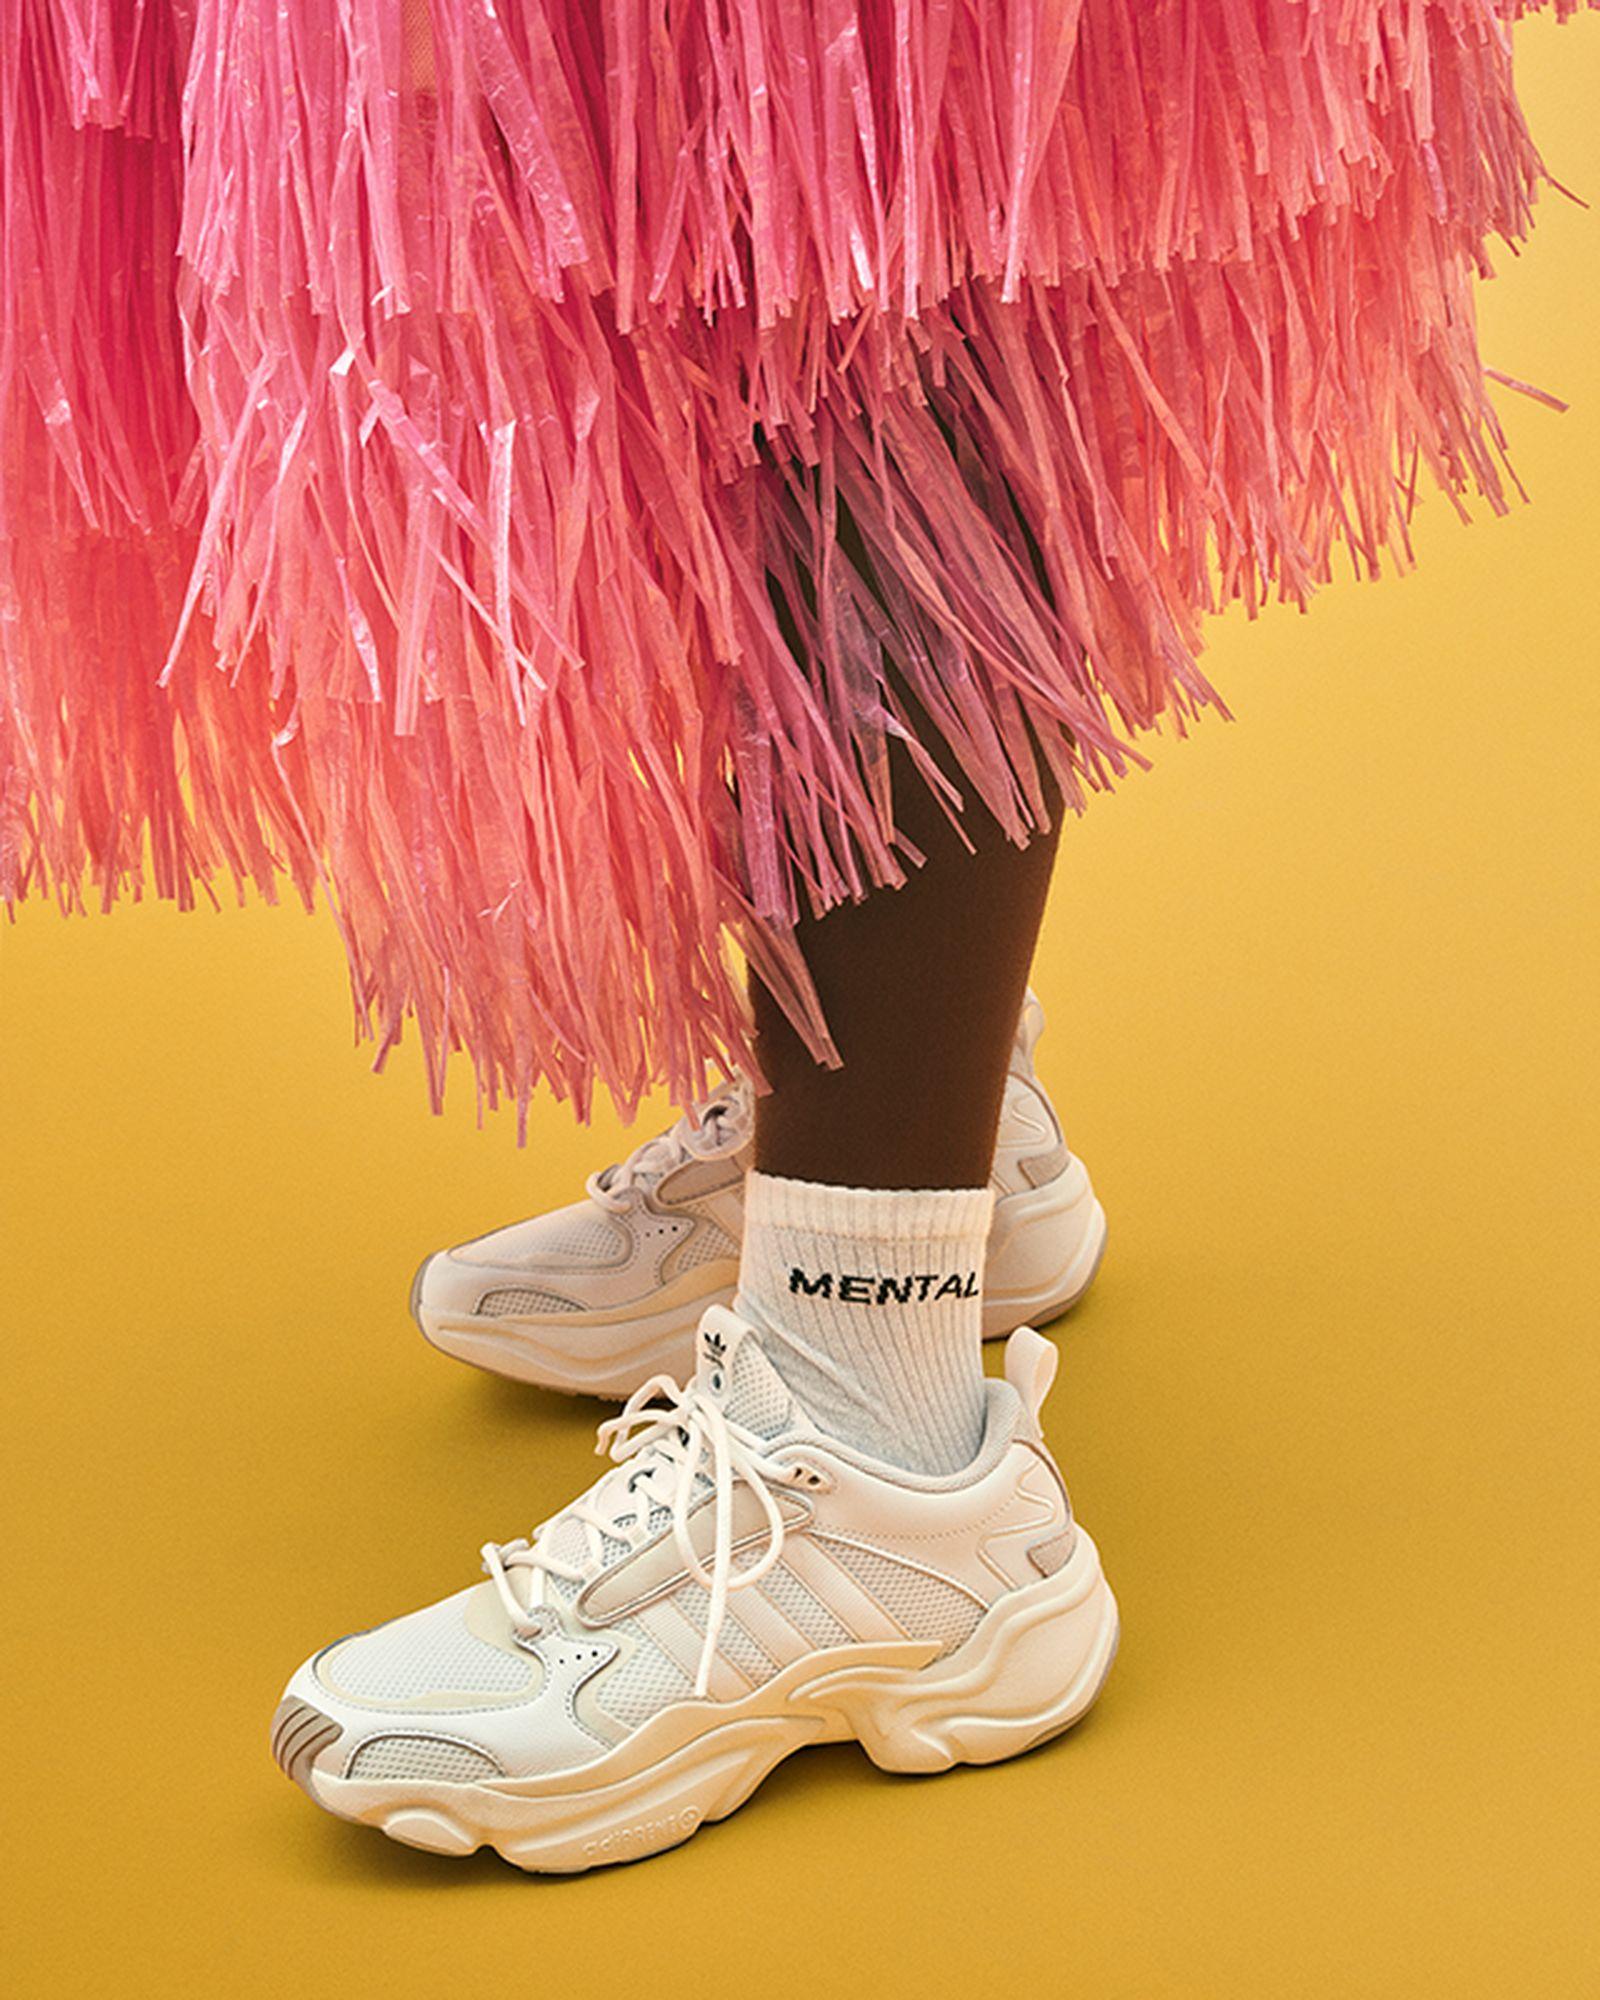 naked adidas magmur runner release date price 3 adidas consortium